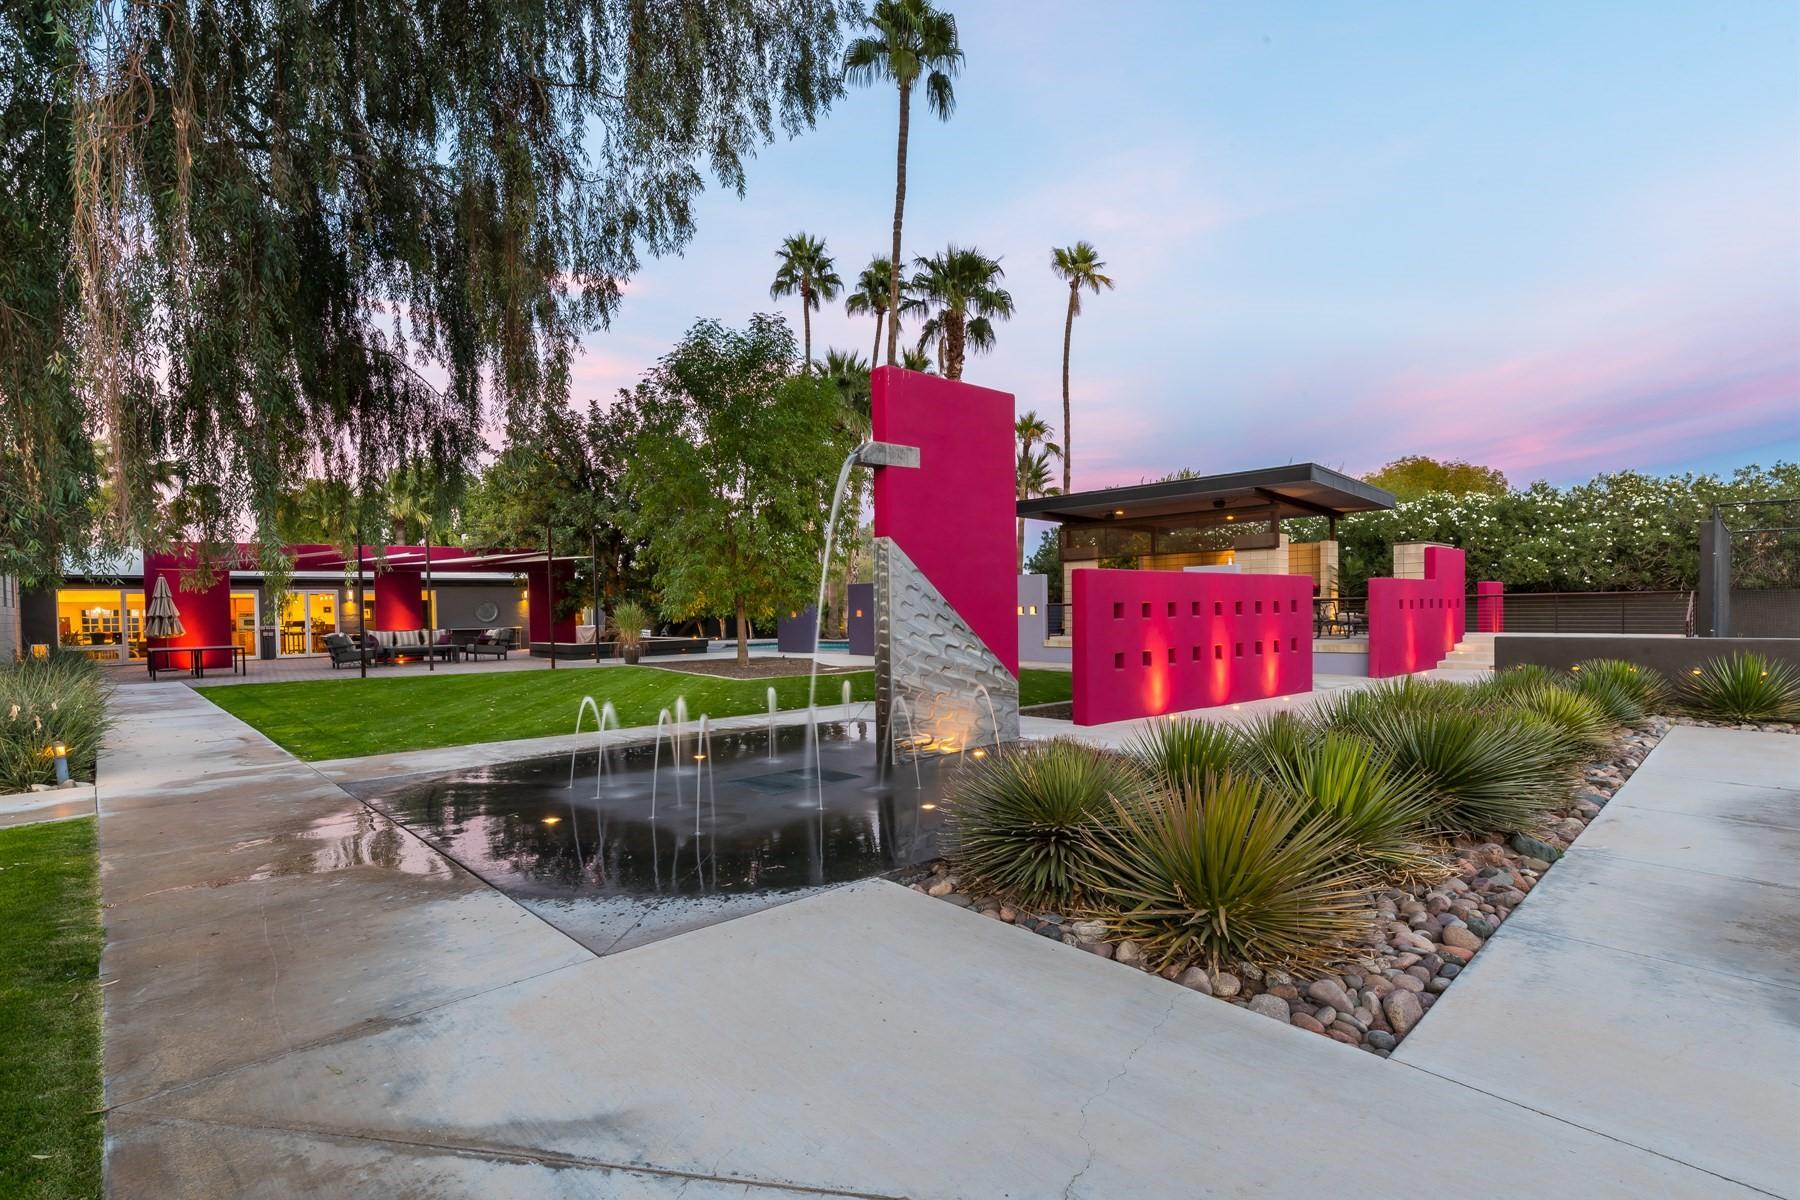 獨棟家庭住宅 為 出售 在 Resort style living in Mockingbird Meadows 6833 E Belmont Circle, Paradise Valley, 亞利桑那州, 85253 美國